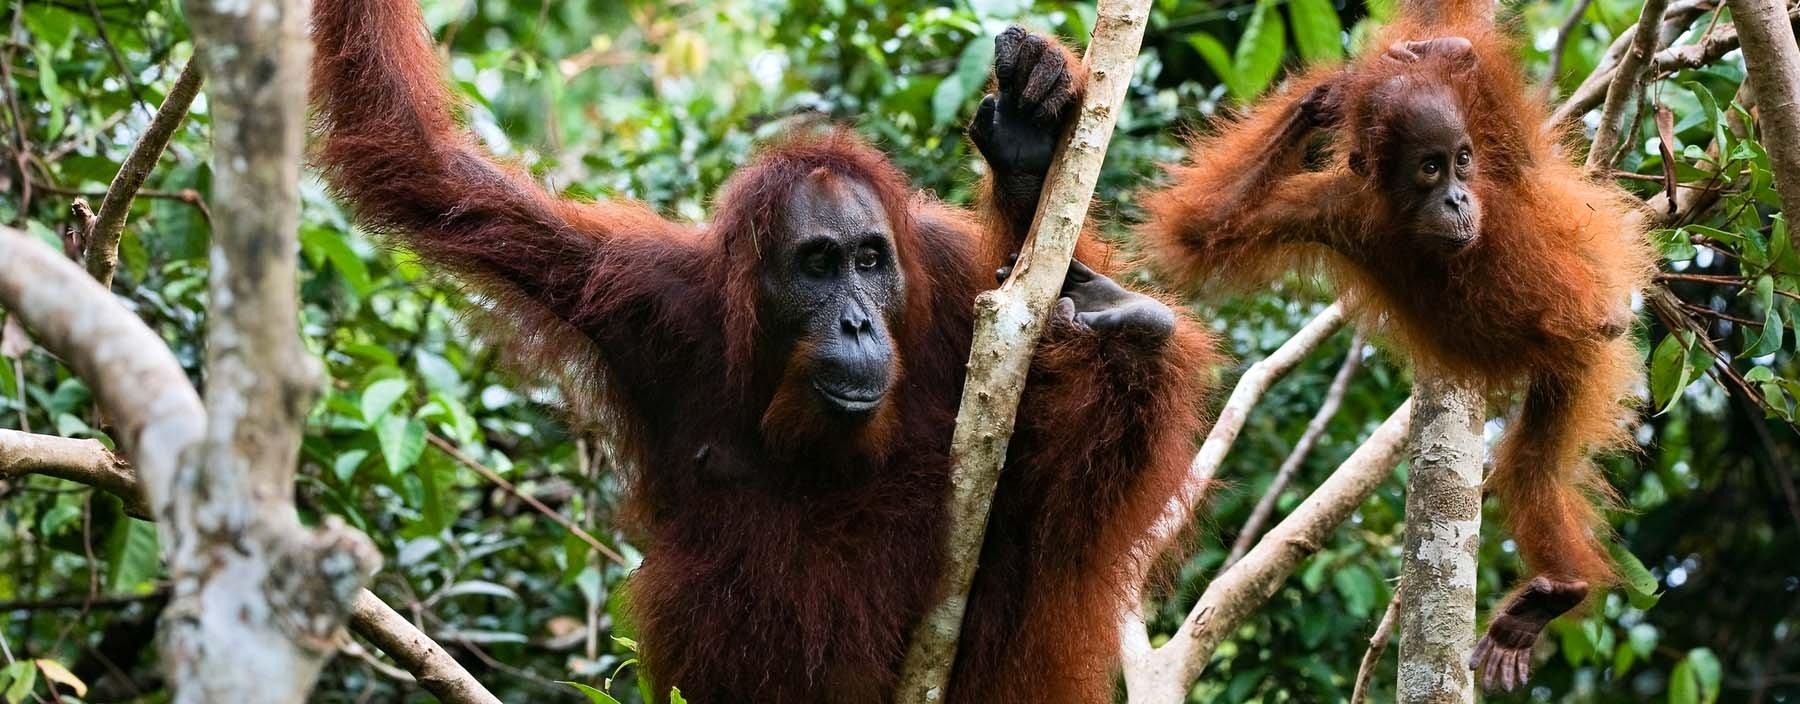 id, algemeen, orangutan (2).jpg